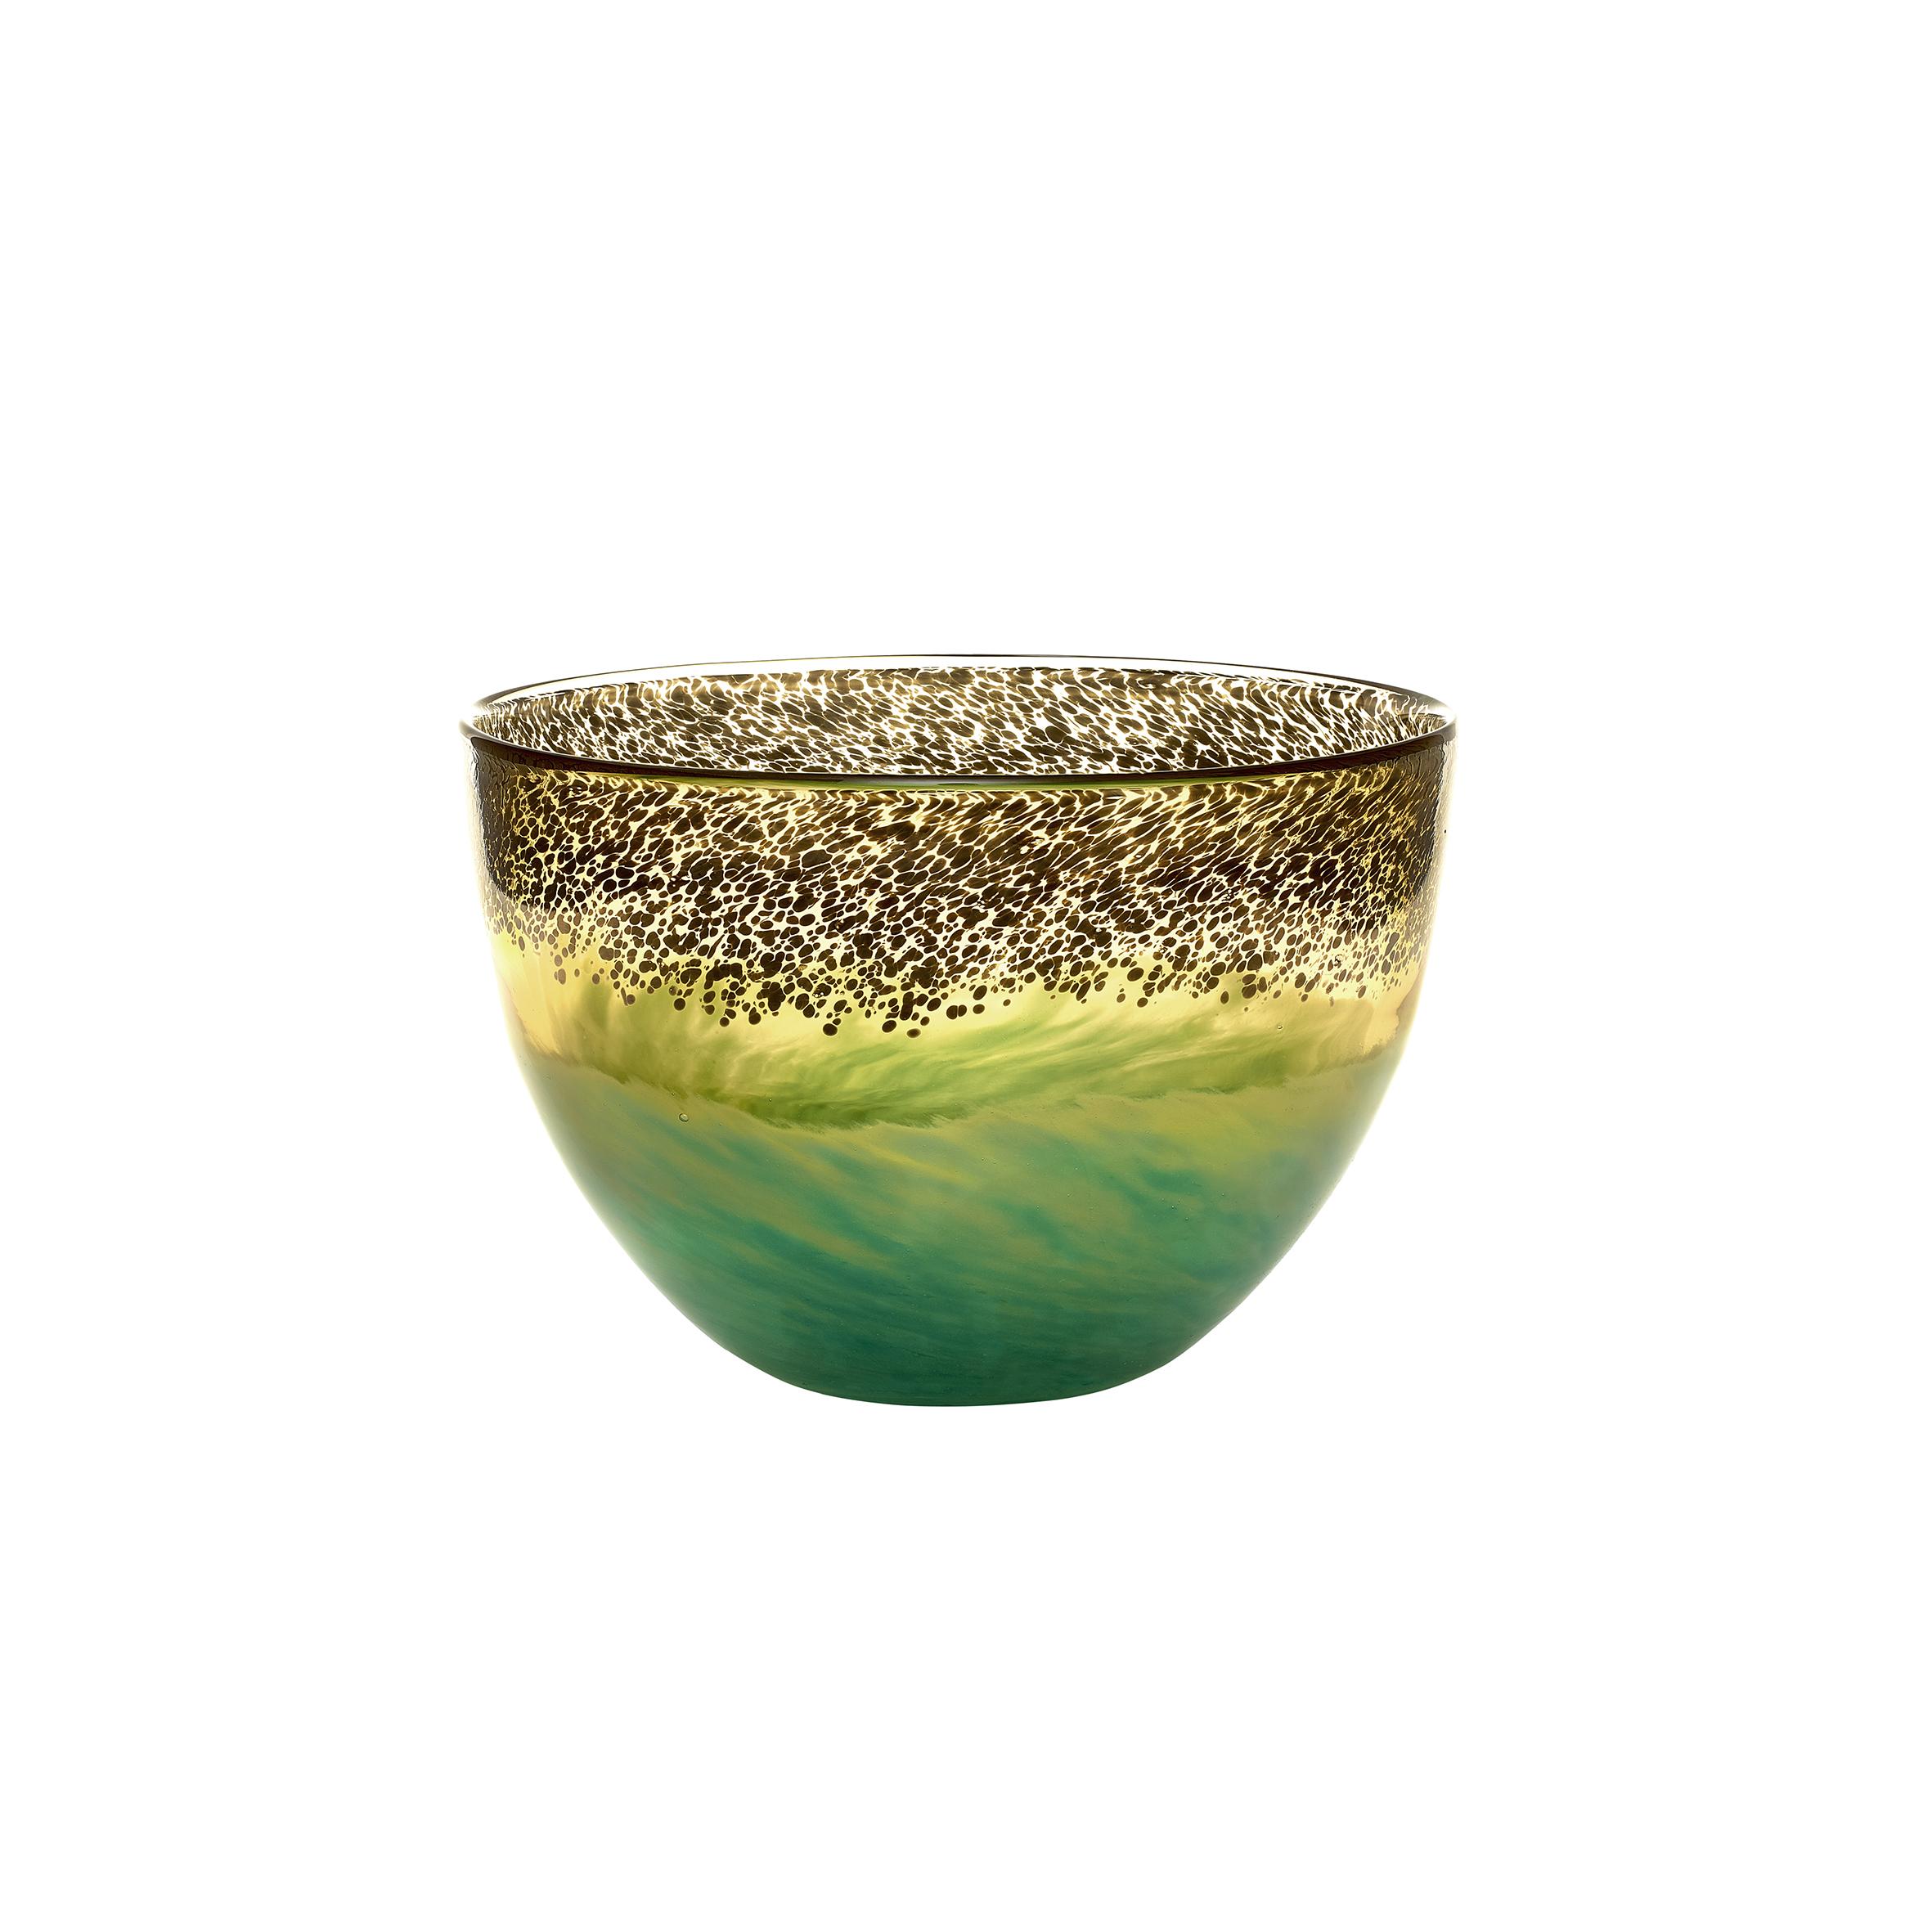 Demeter Gold Bowl Vase 14x21x21cm